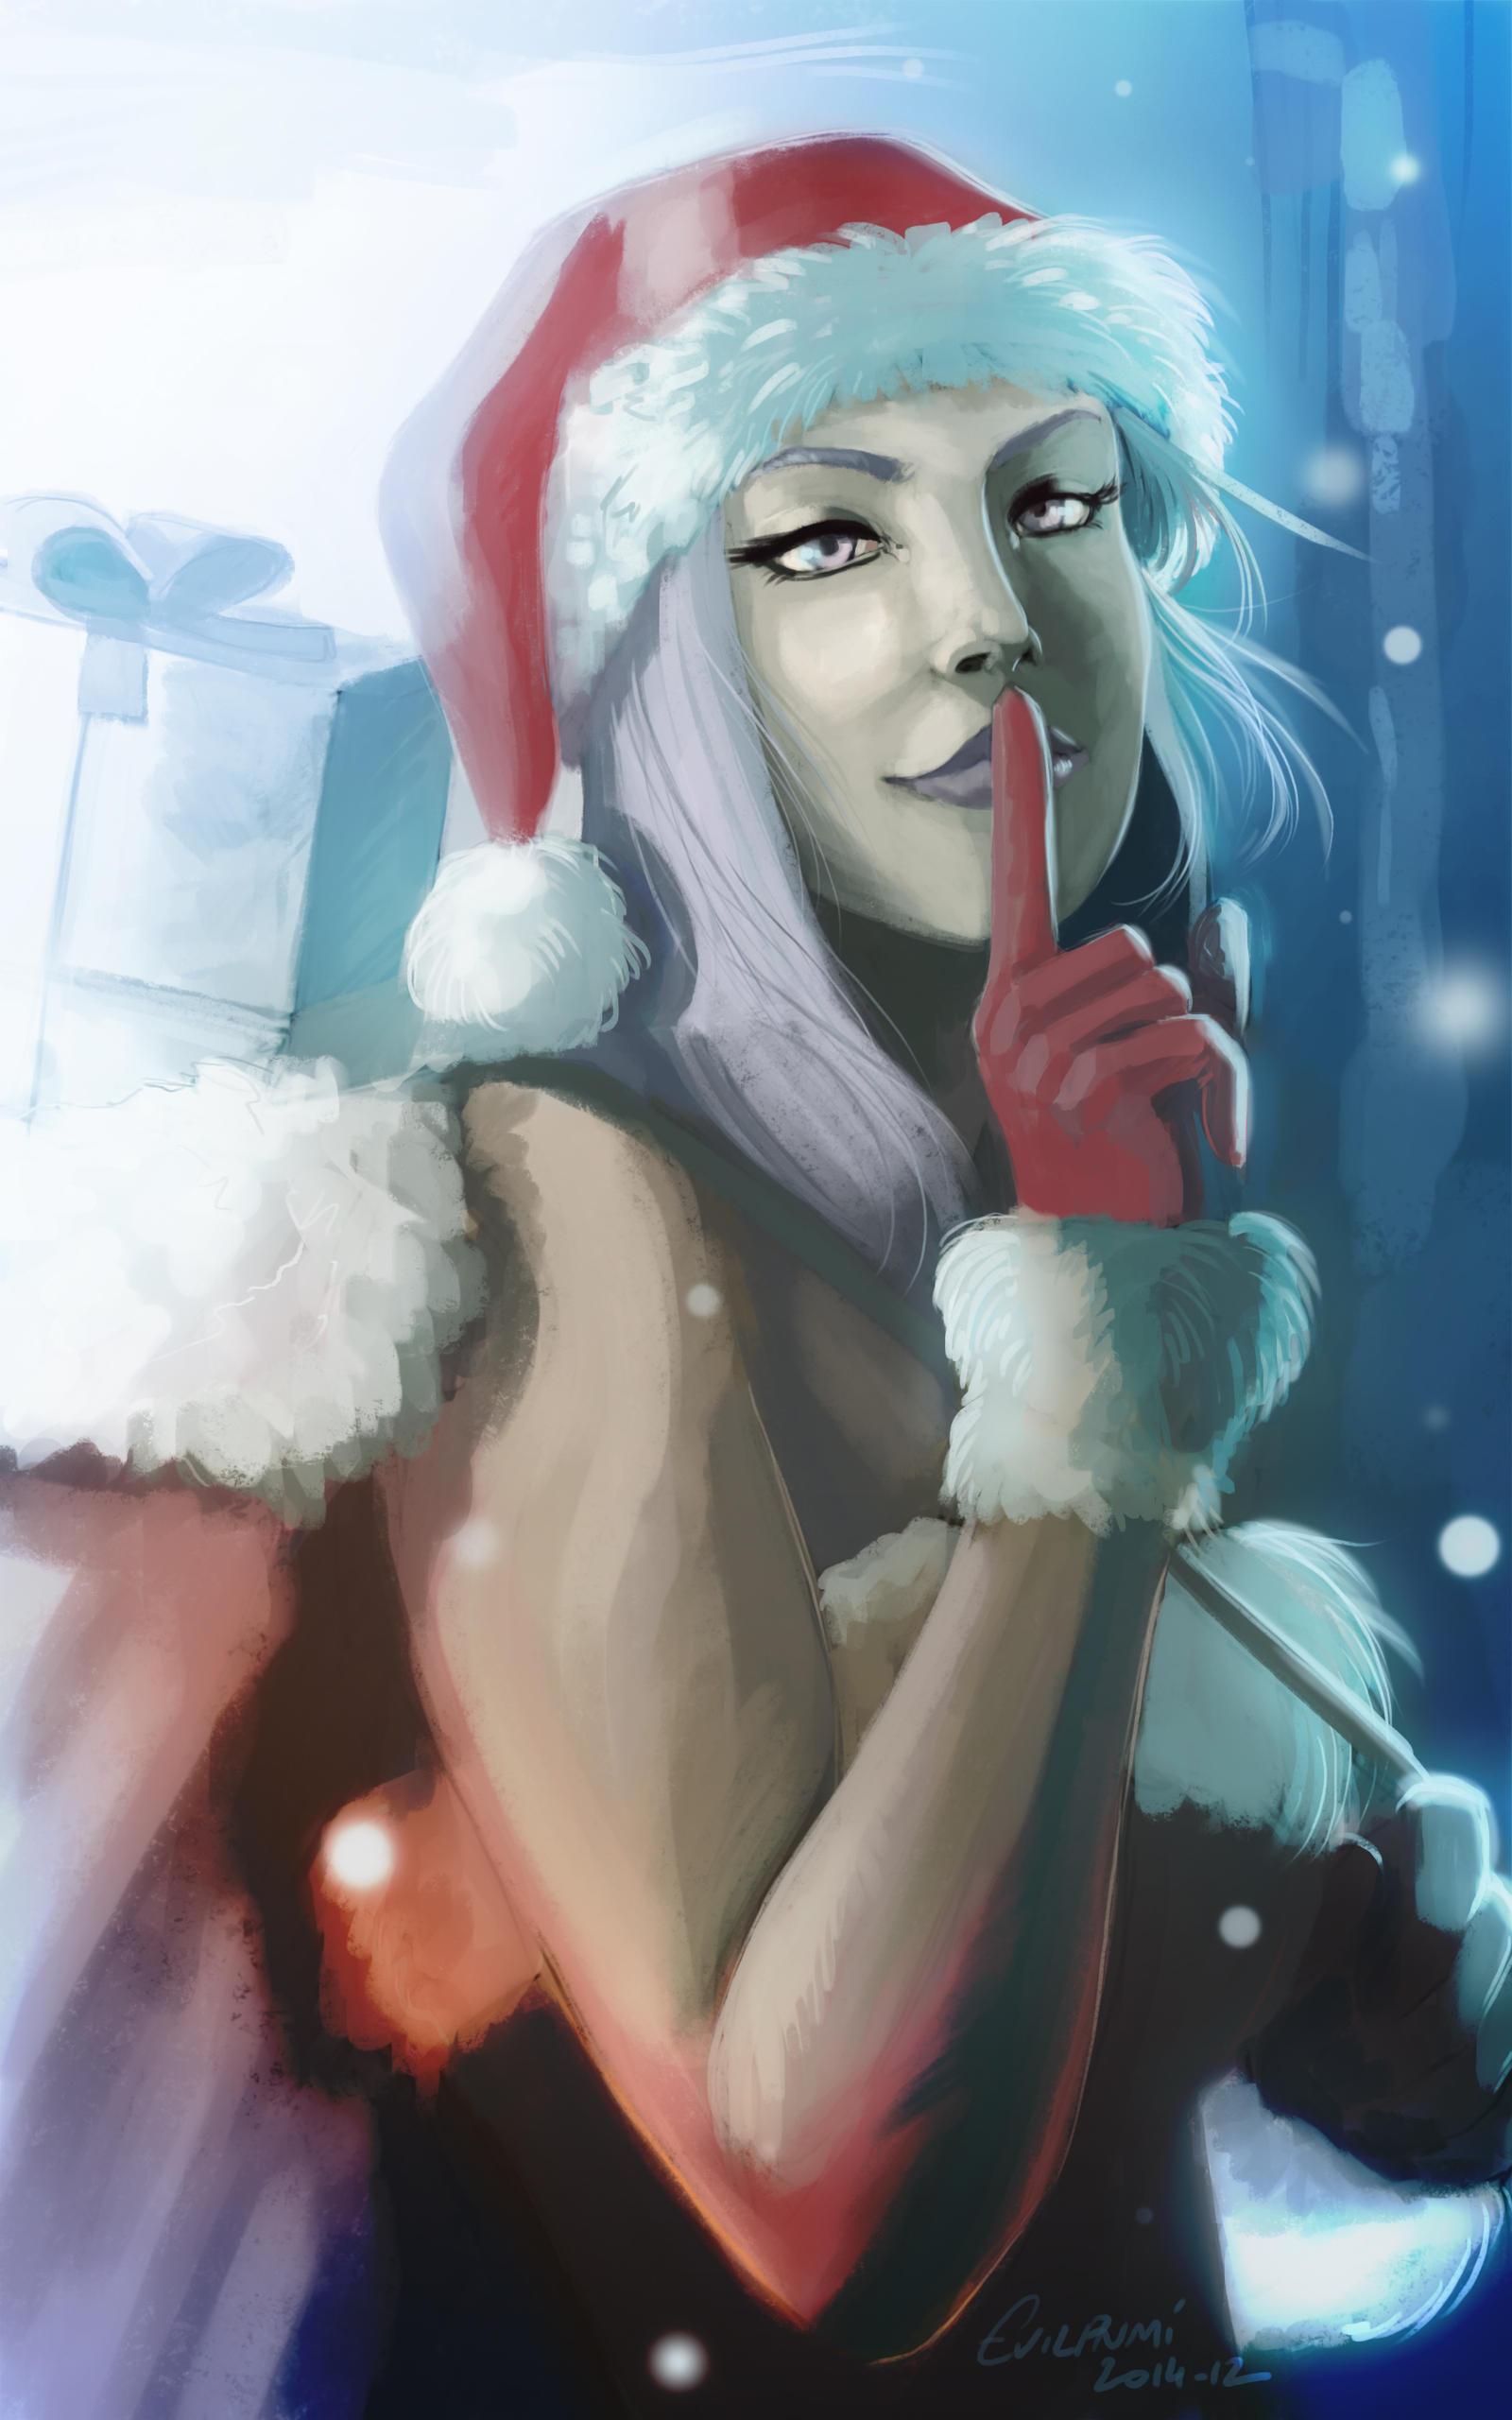 30 days of Lestaelle - Christmas special 2014 by EvilPNMI